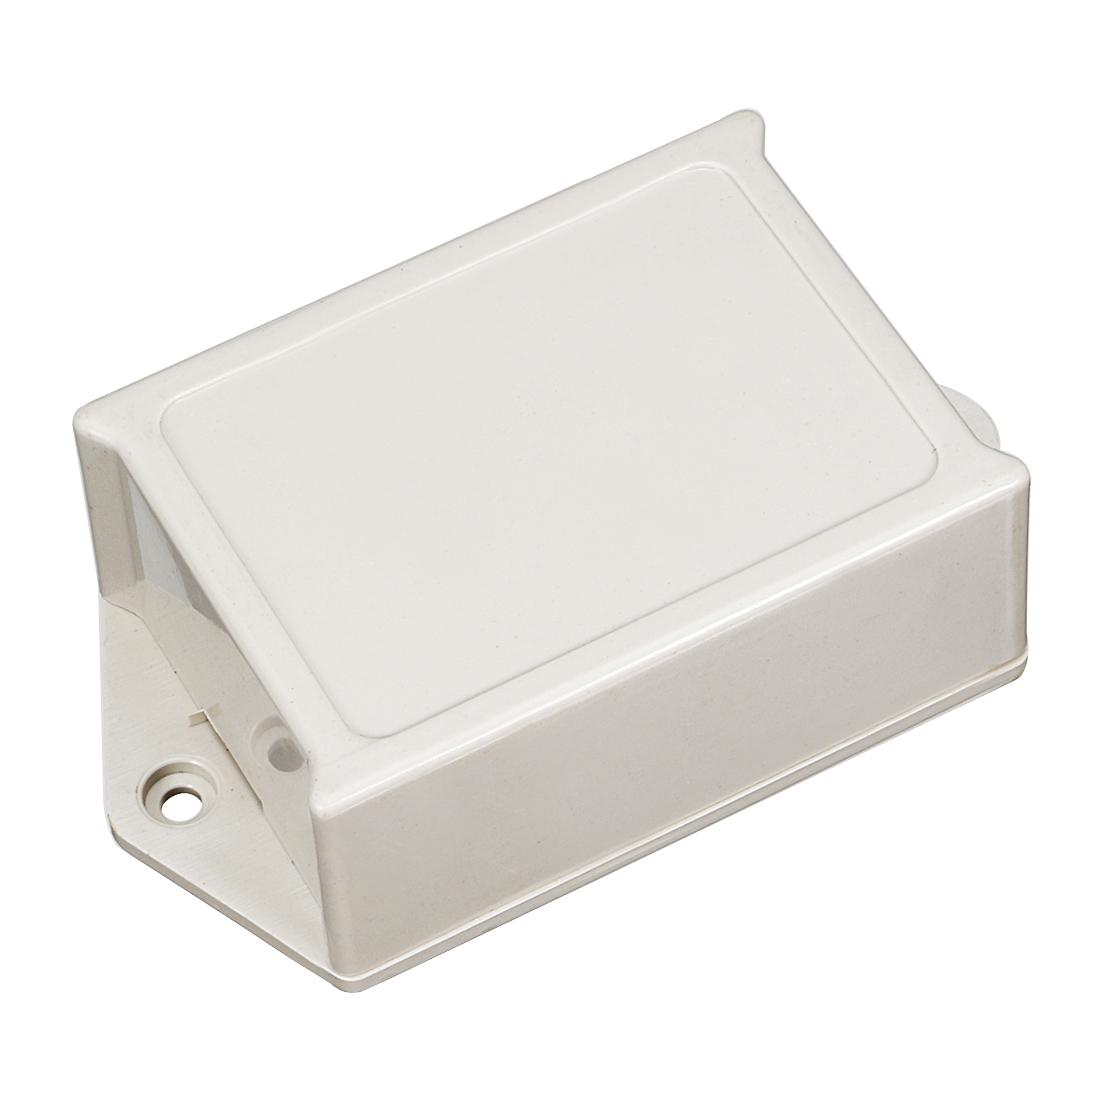 64mm x 45mm x 26mm Plastic Waterproof Enclosure Case DIY Junction Box